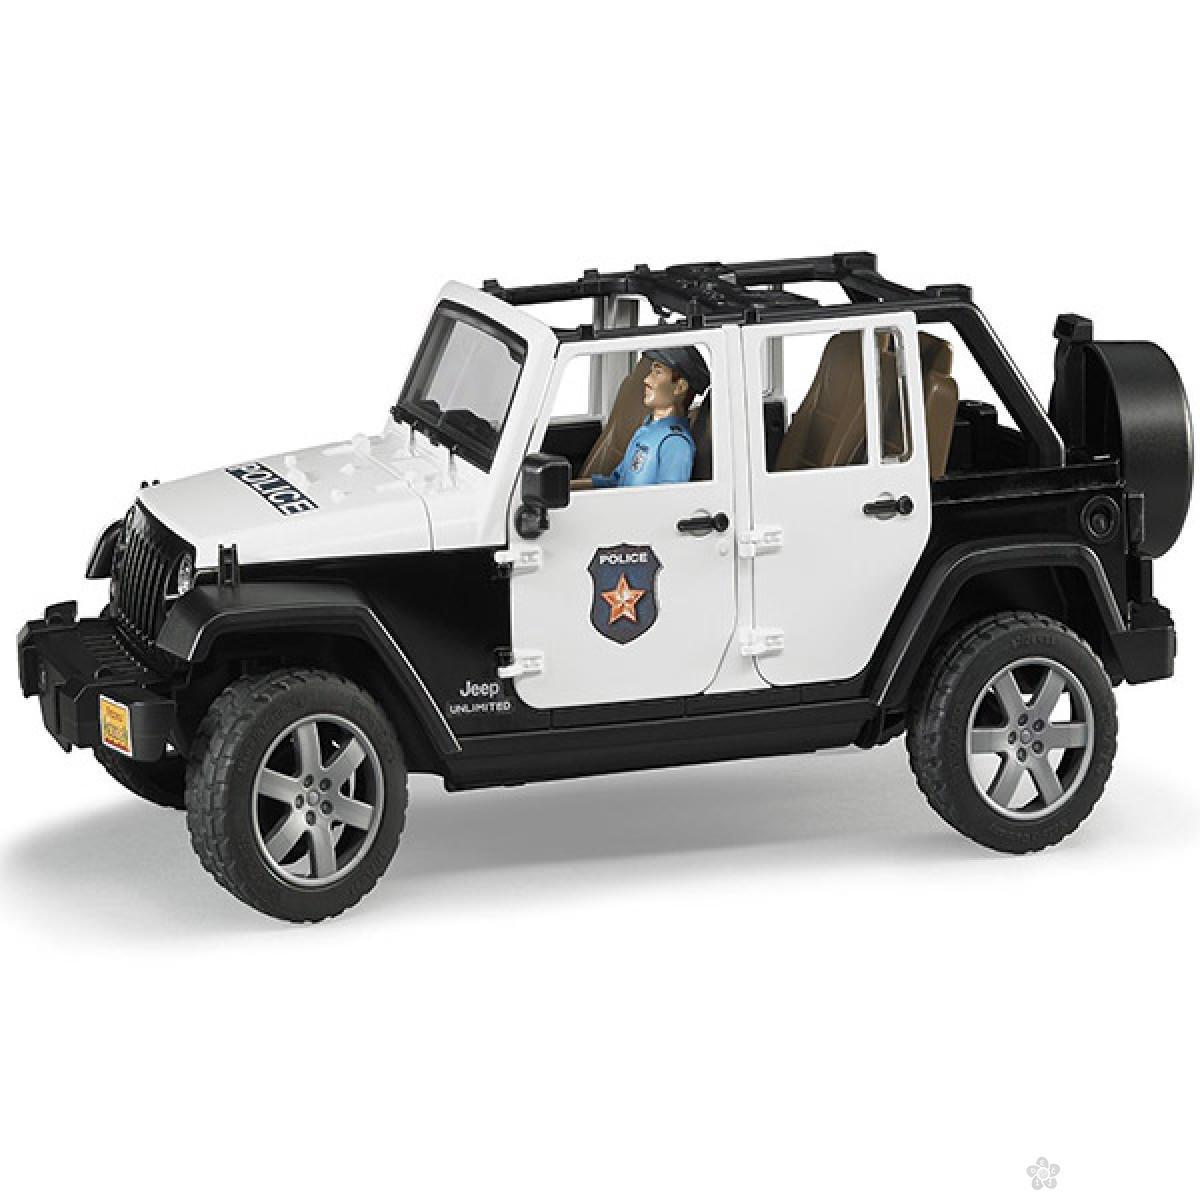 Jeep Wrangler UR police sa policajcem 025267